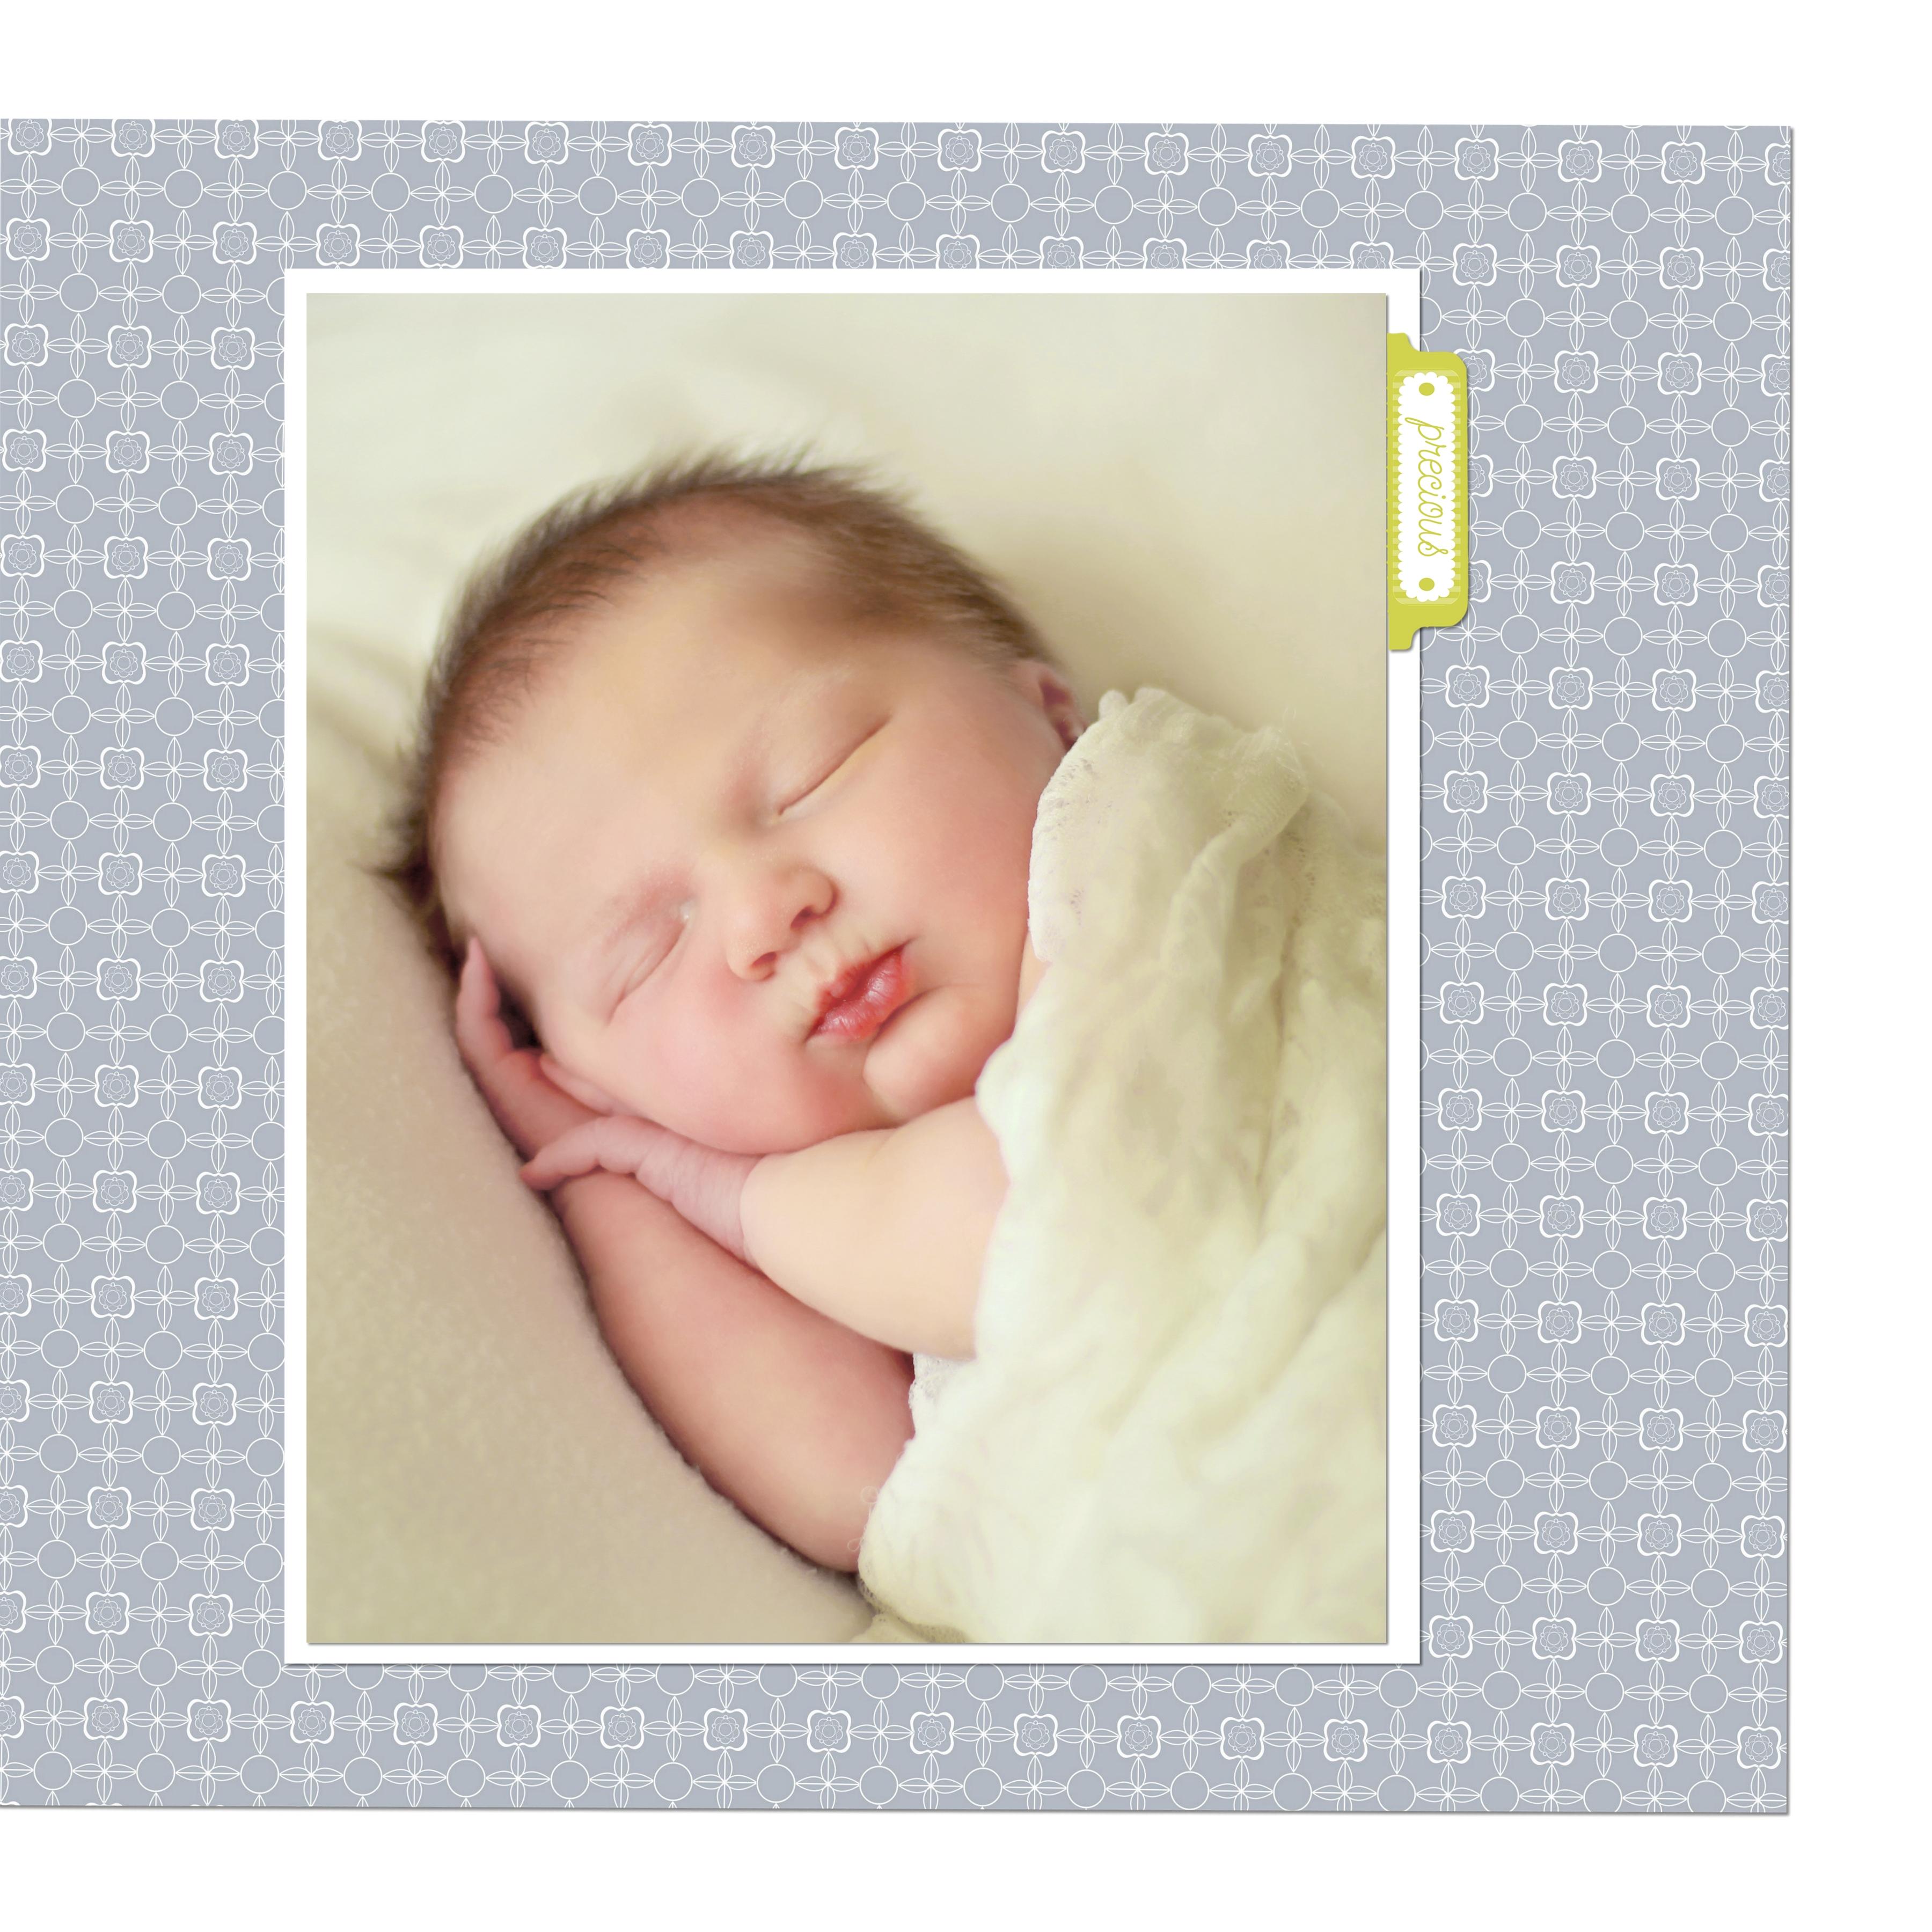 BabyBoy - Page 009.jpg